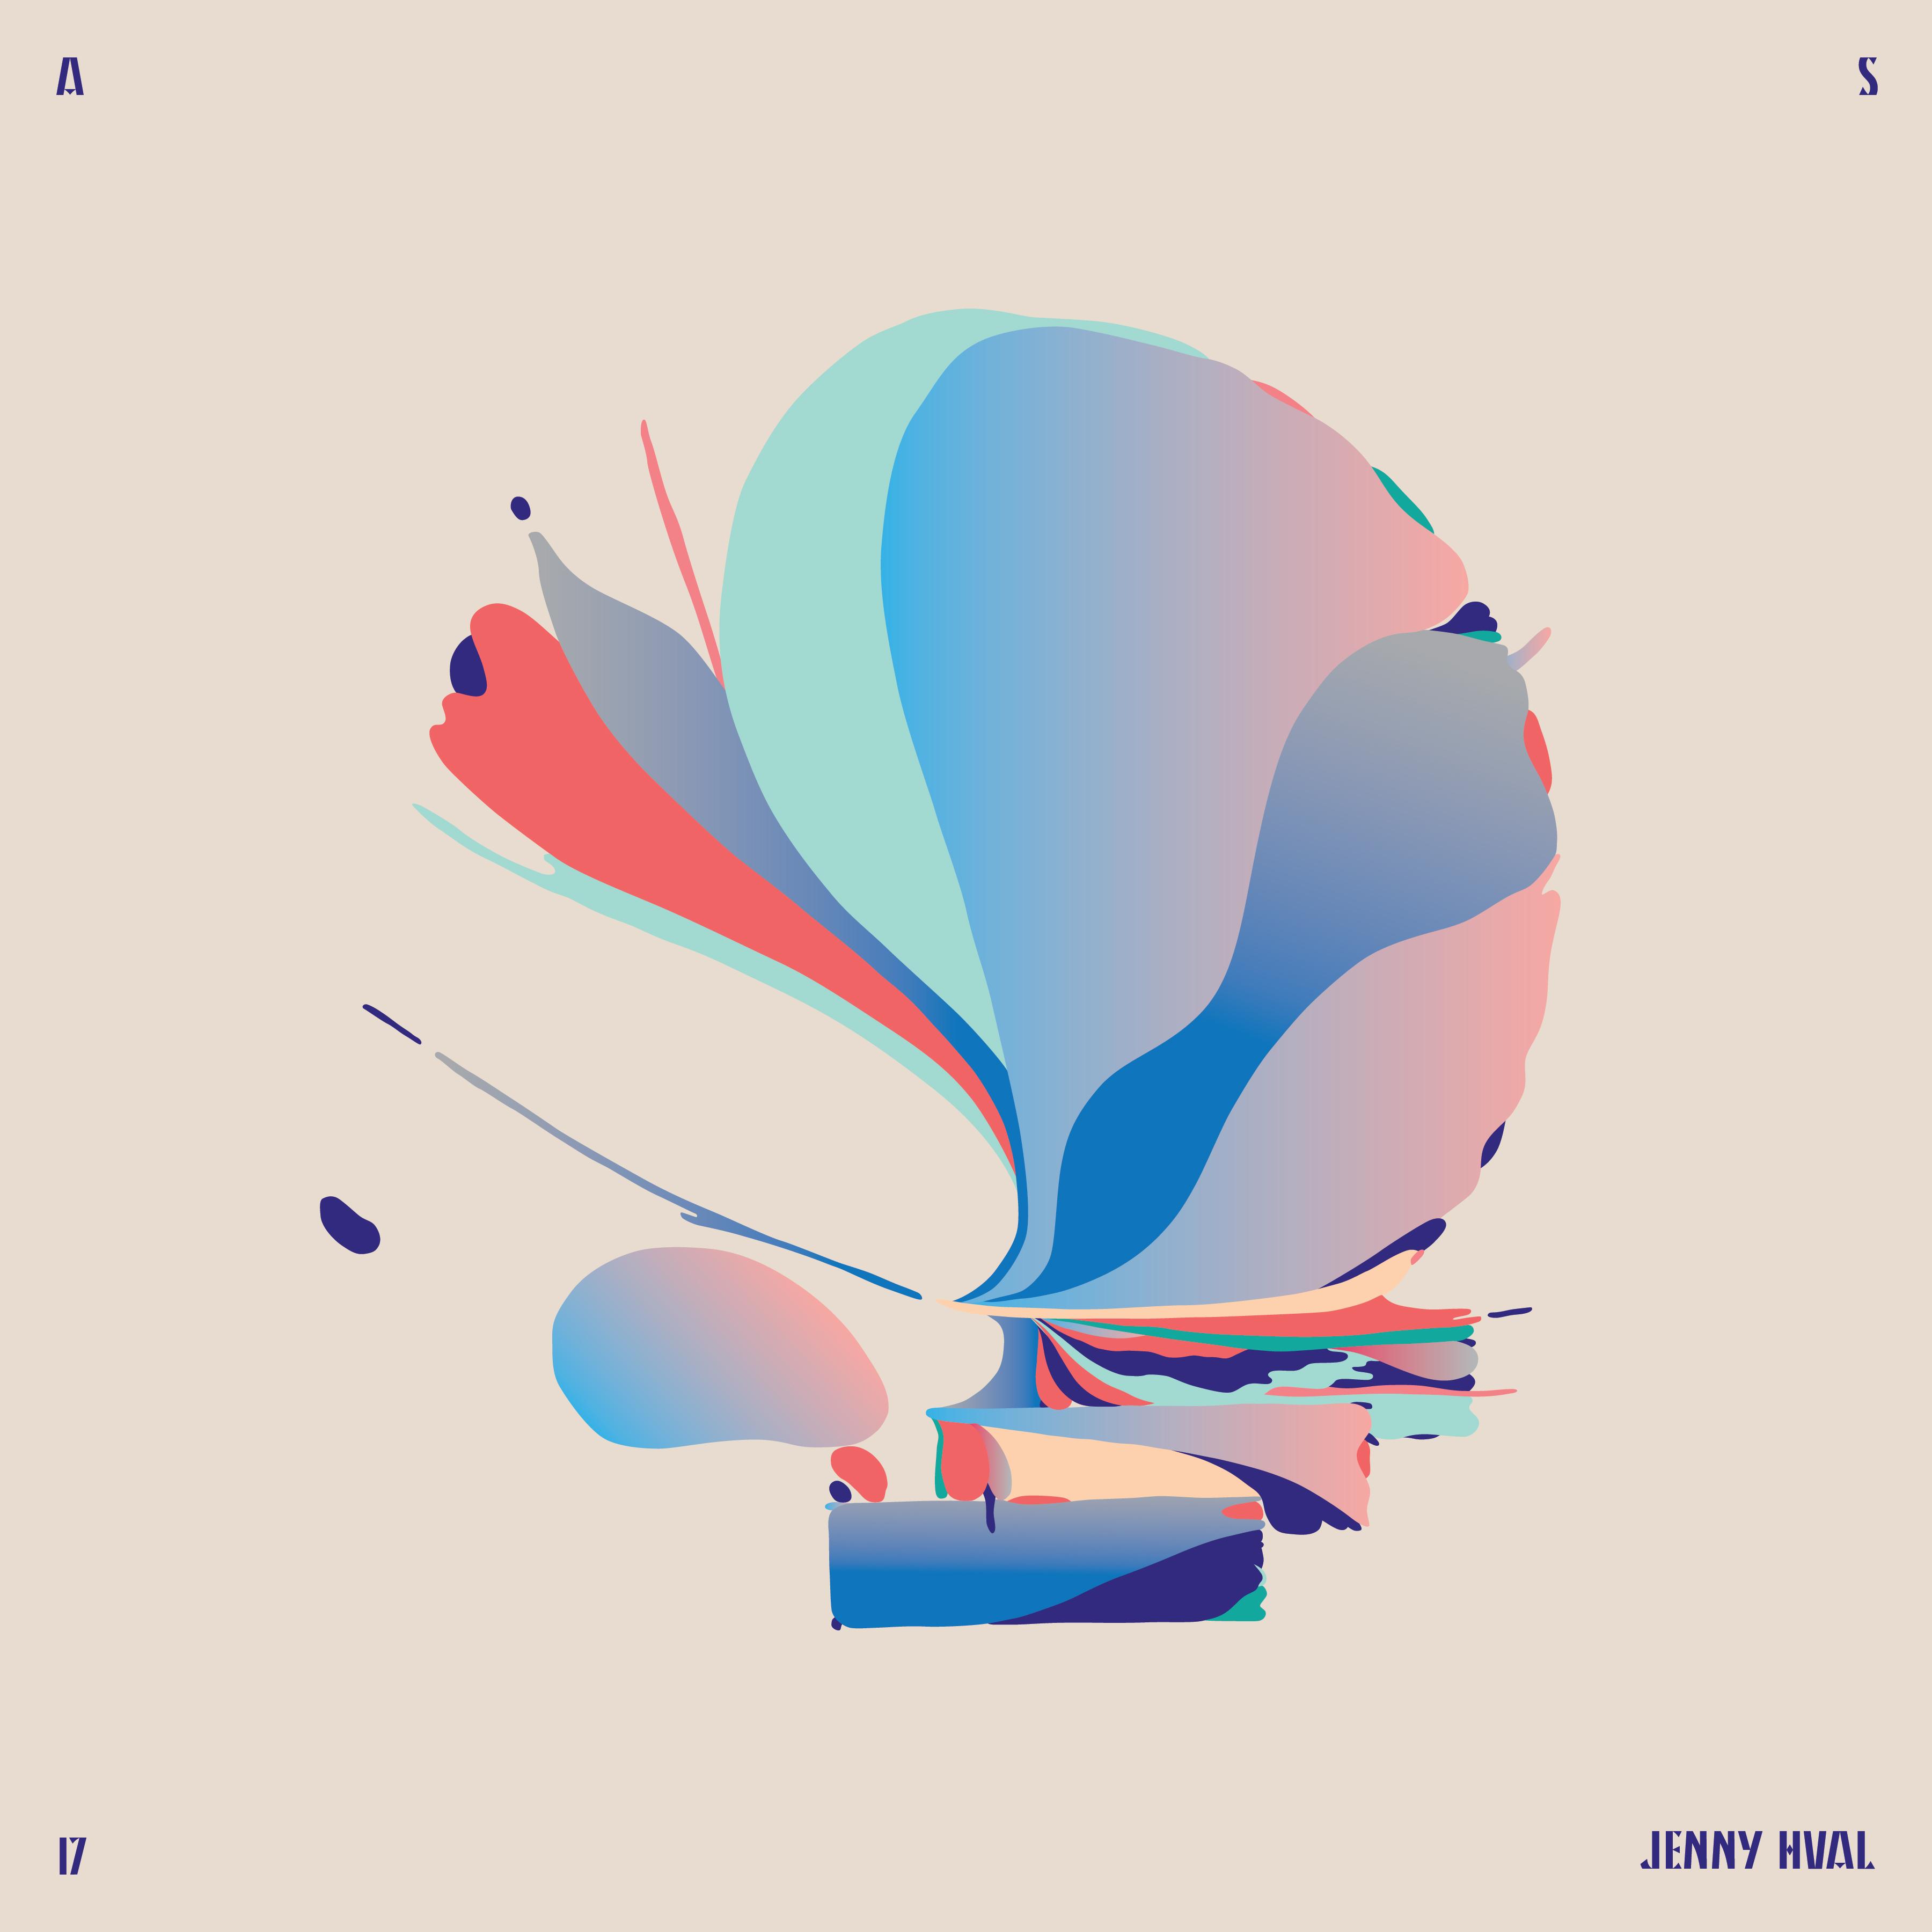 as singles jenny hval final1 Jenny Hval premieres otherworldly new song Period Piece    listen